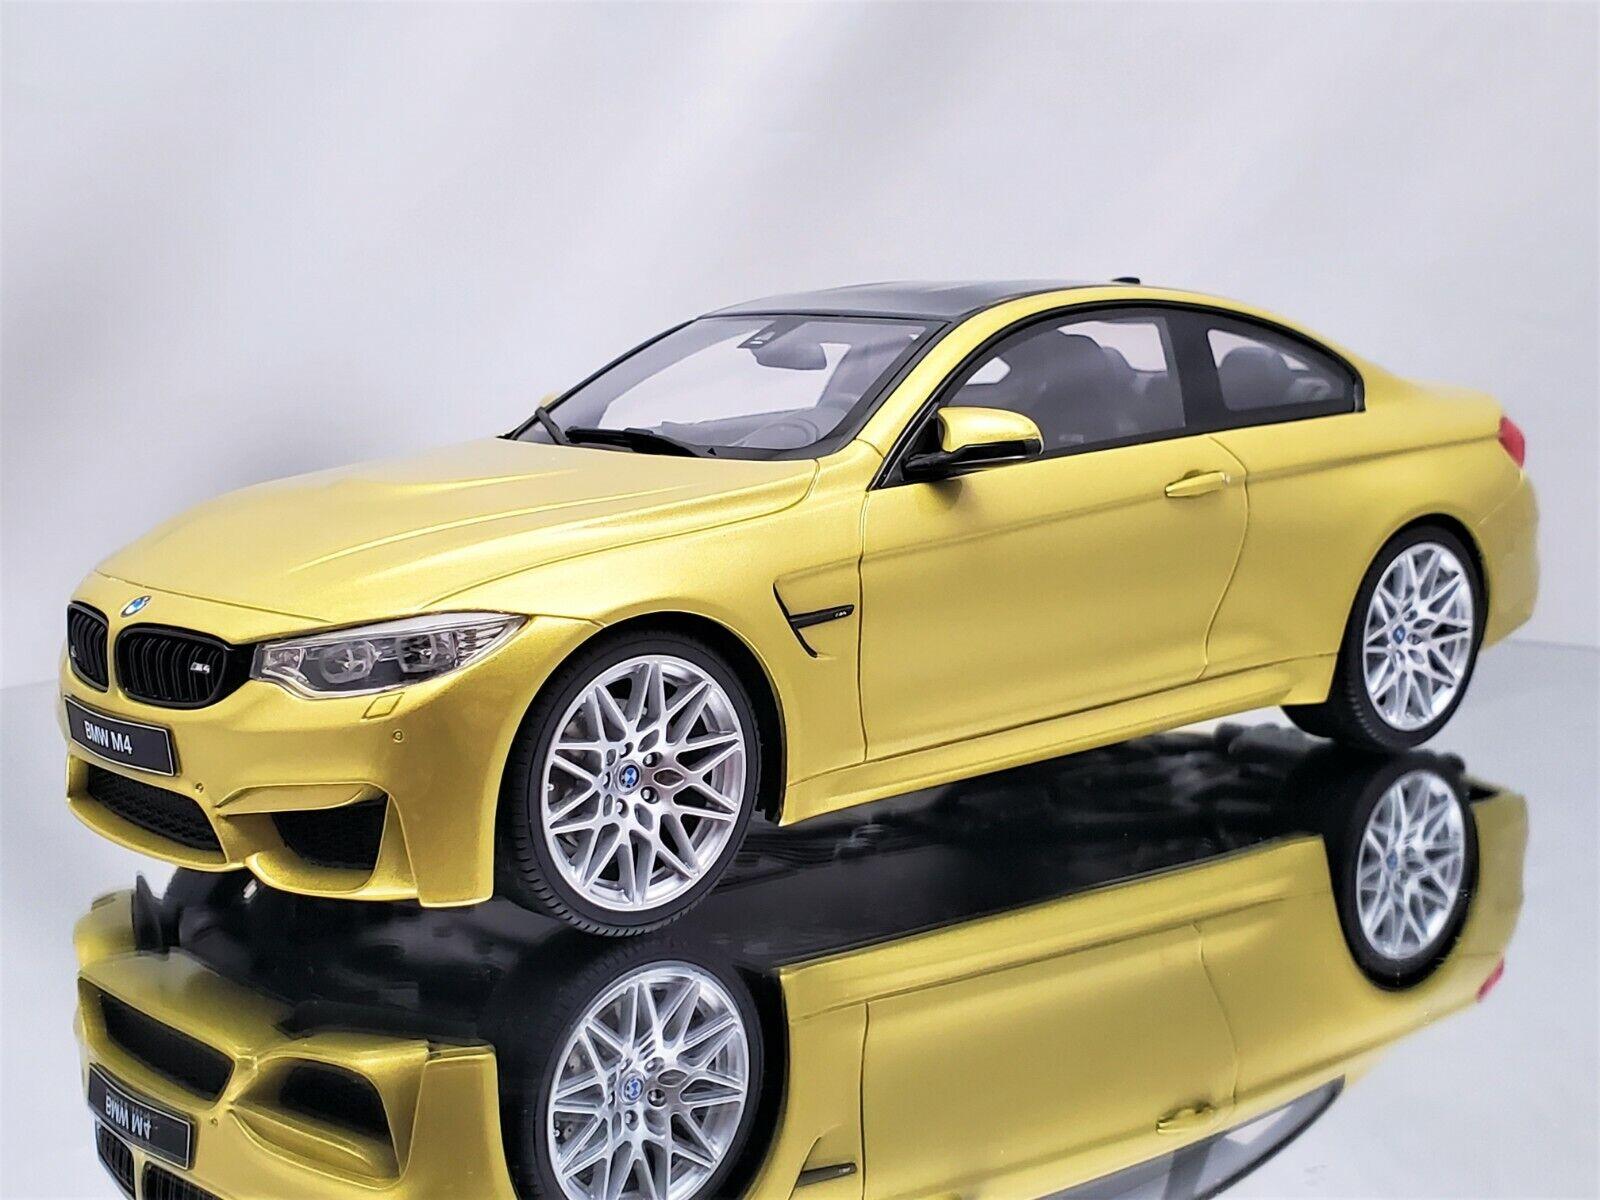 BMW M4 Coupe F82 2014-19 gelb yellow metallic 1:87 Minichamps